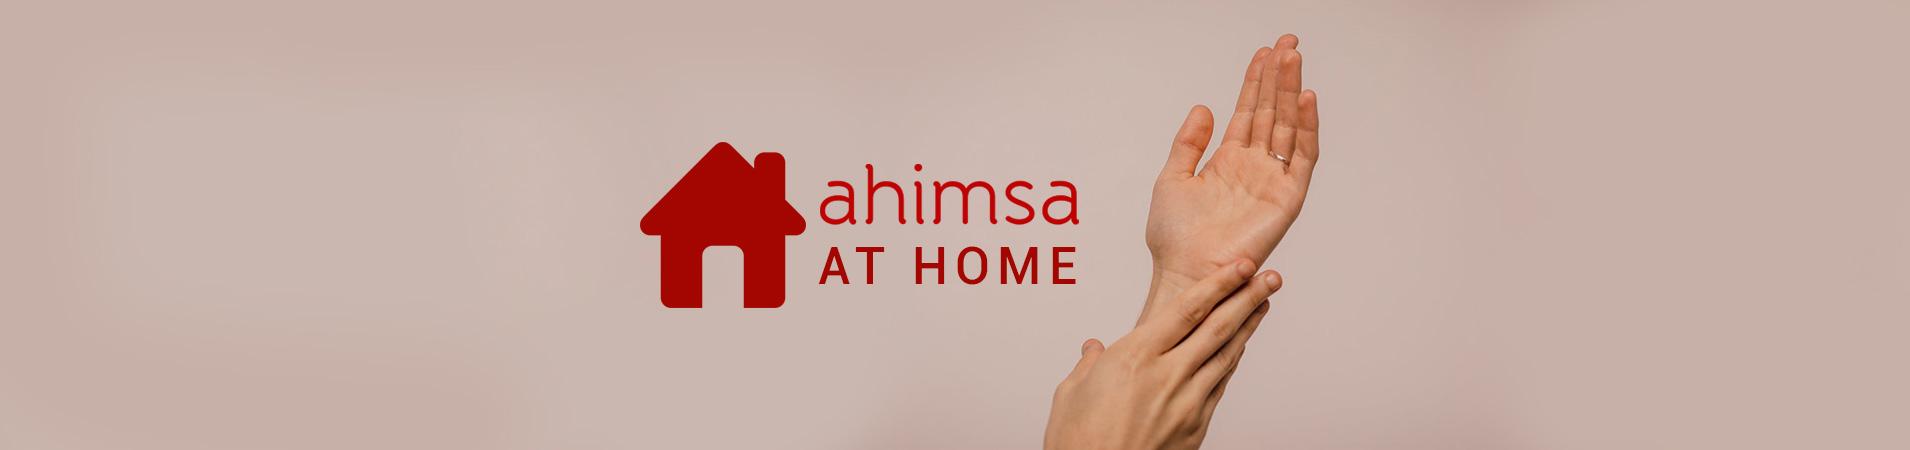 Ahimsa at Home.